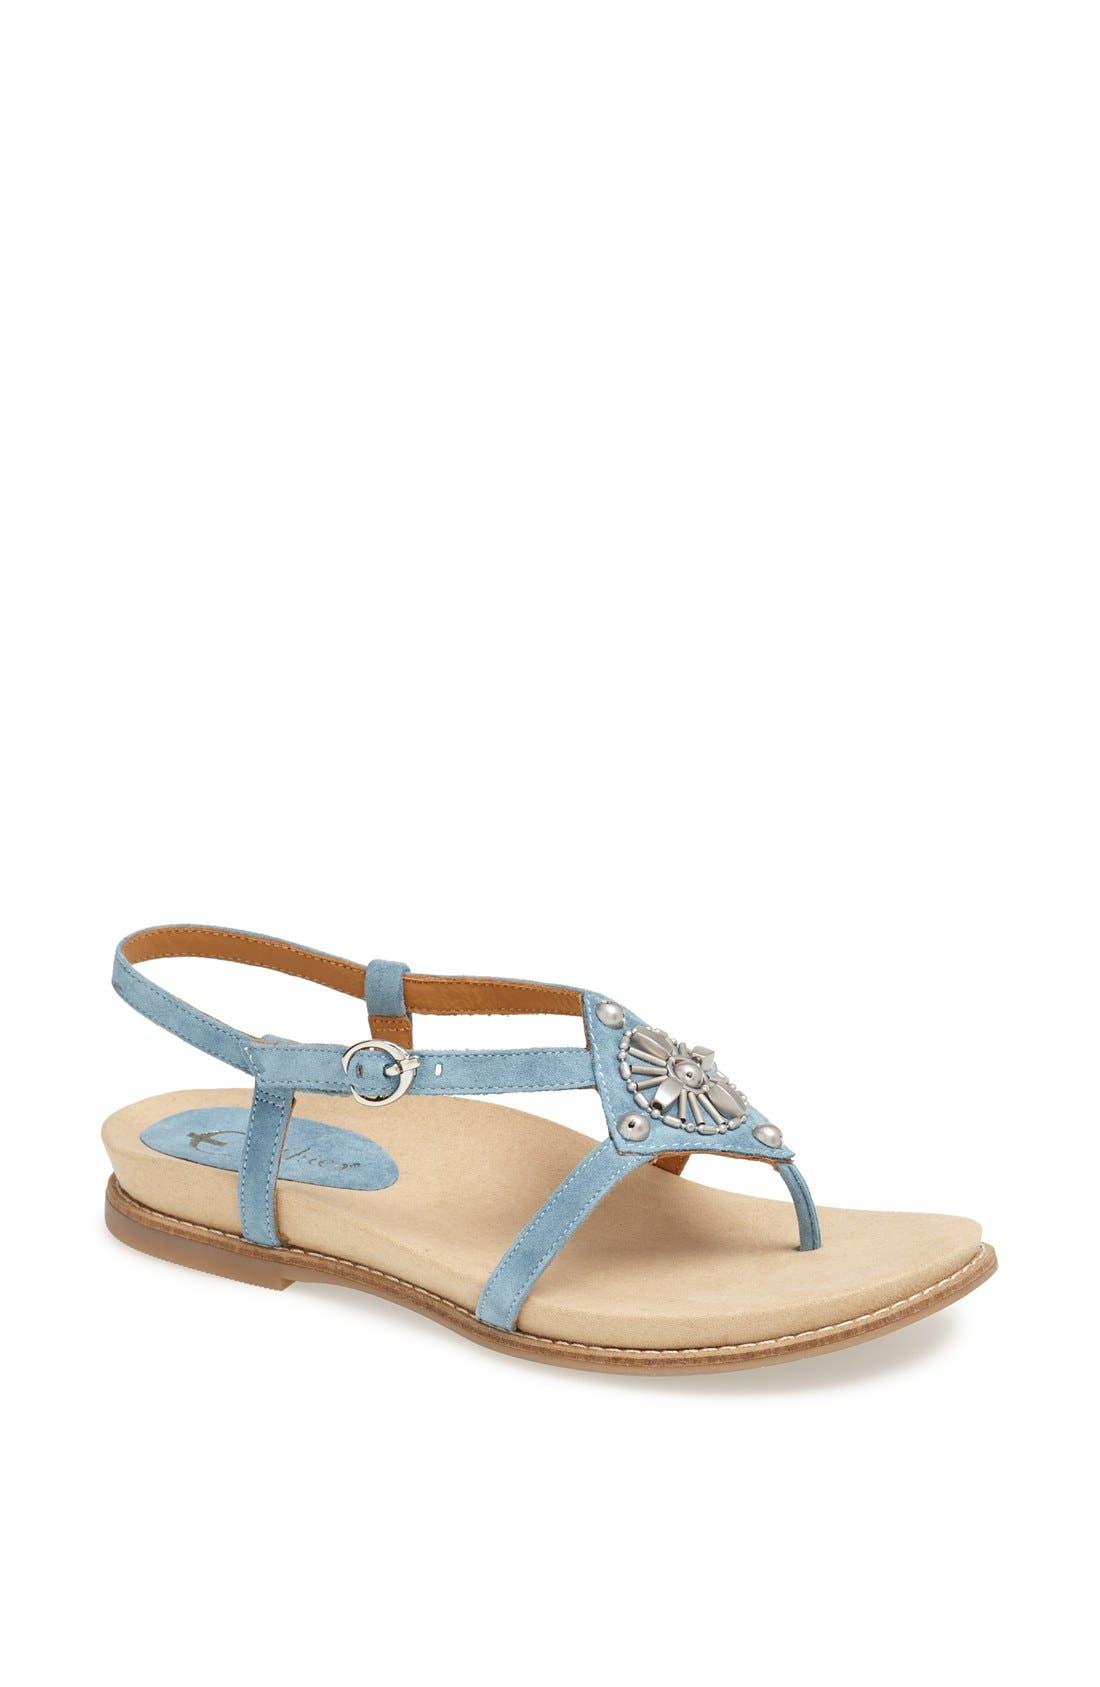 Alternate Image 1 Selected - Earthies® 'Tello' Sandal